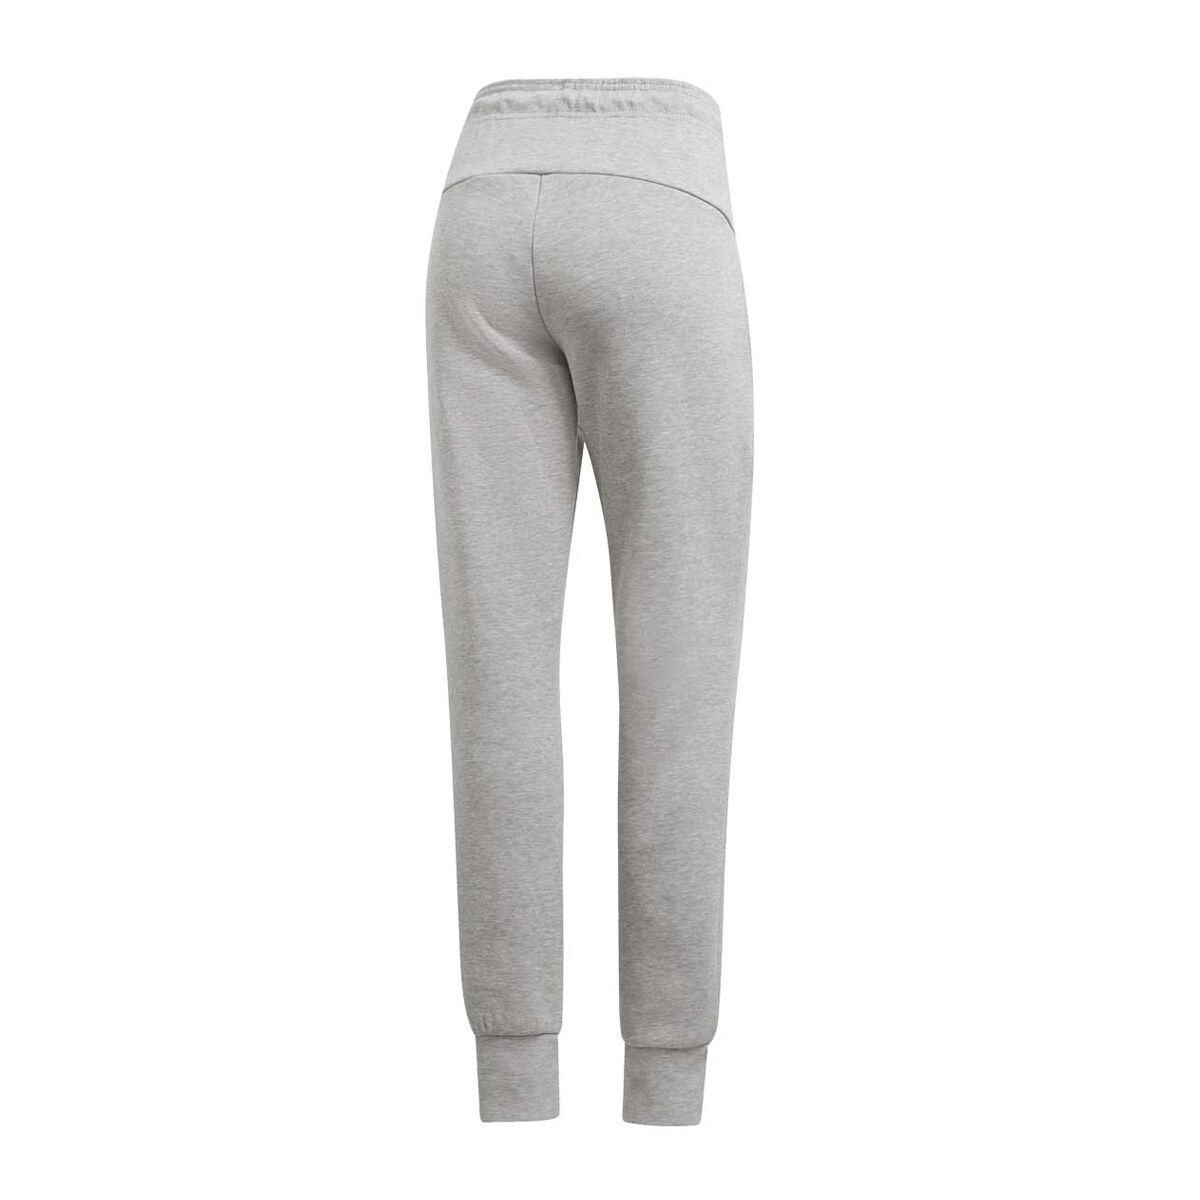 Womens Track Pants Clothing rebel